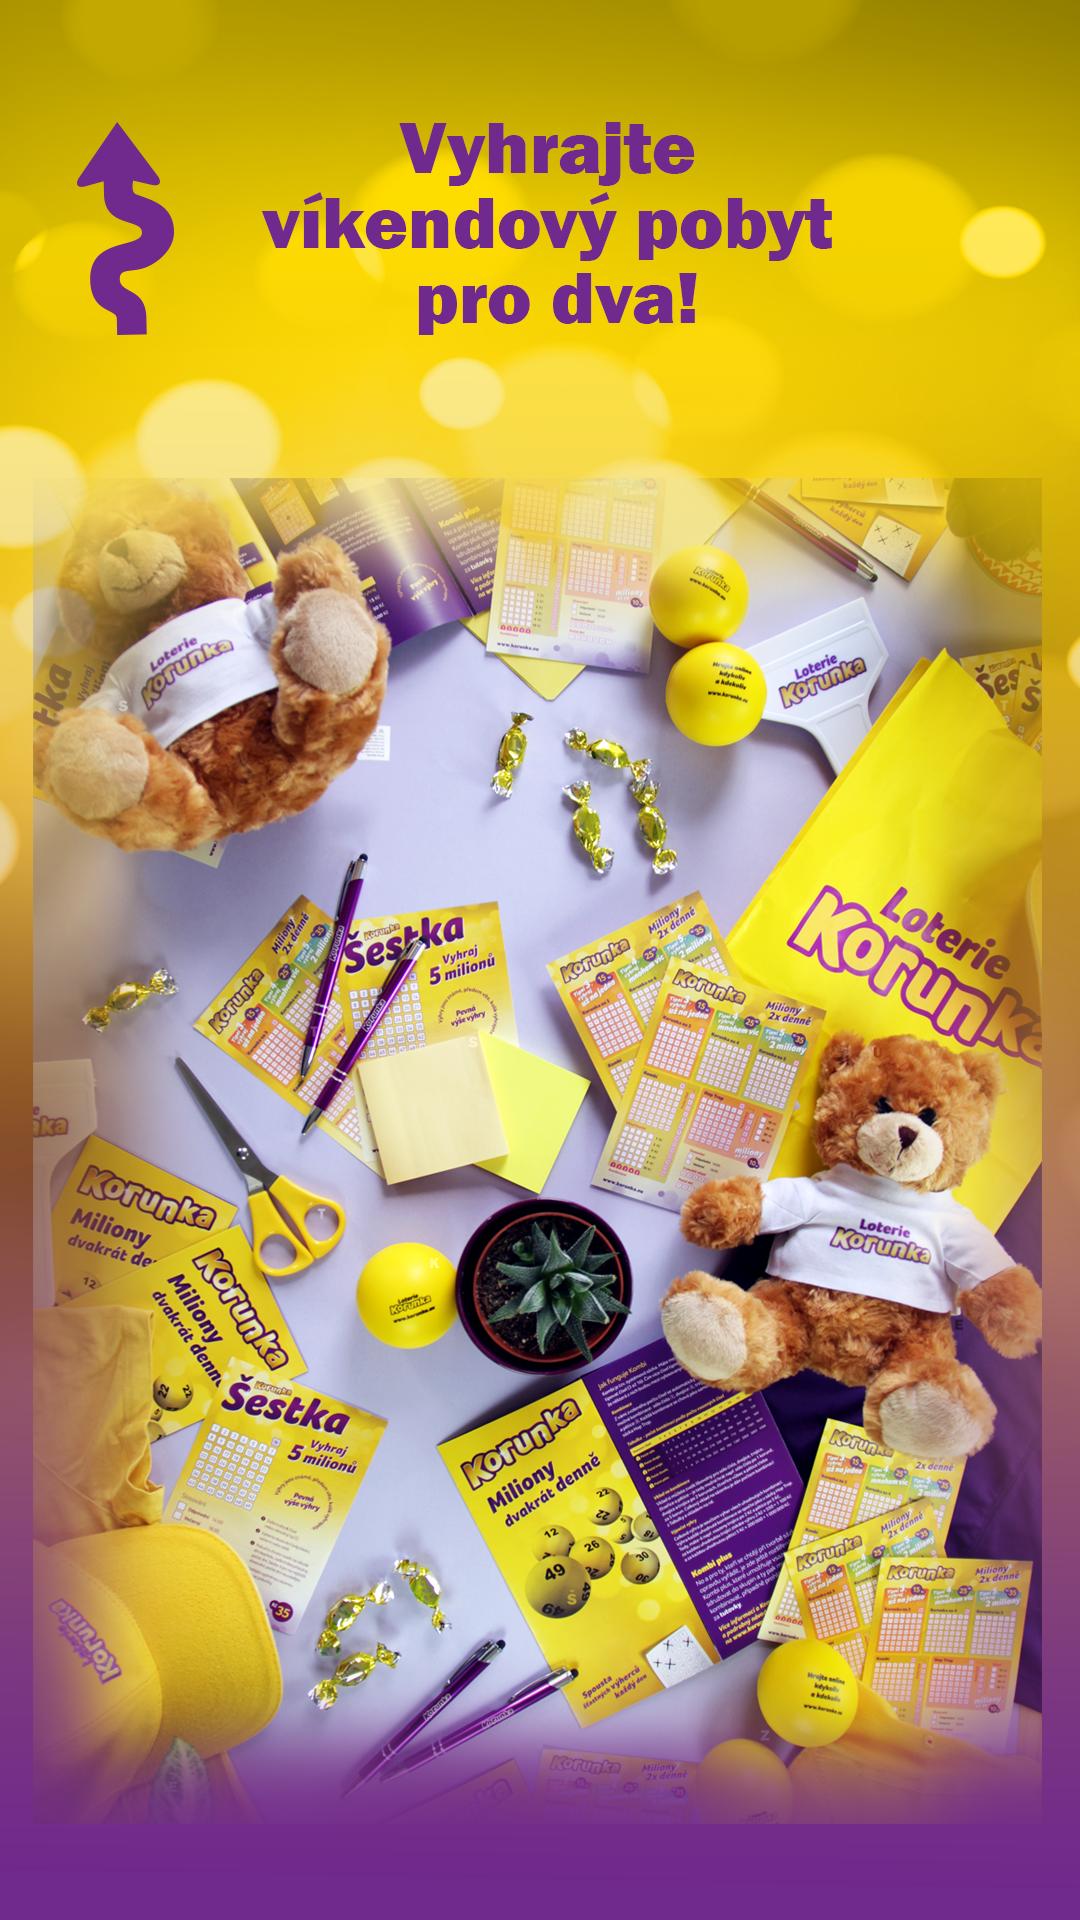 banner korunka graphics creativa lcgnewmedia Playbill